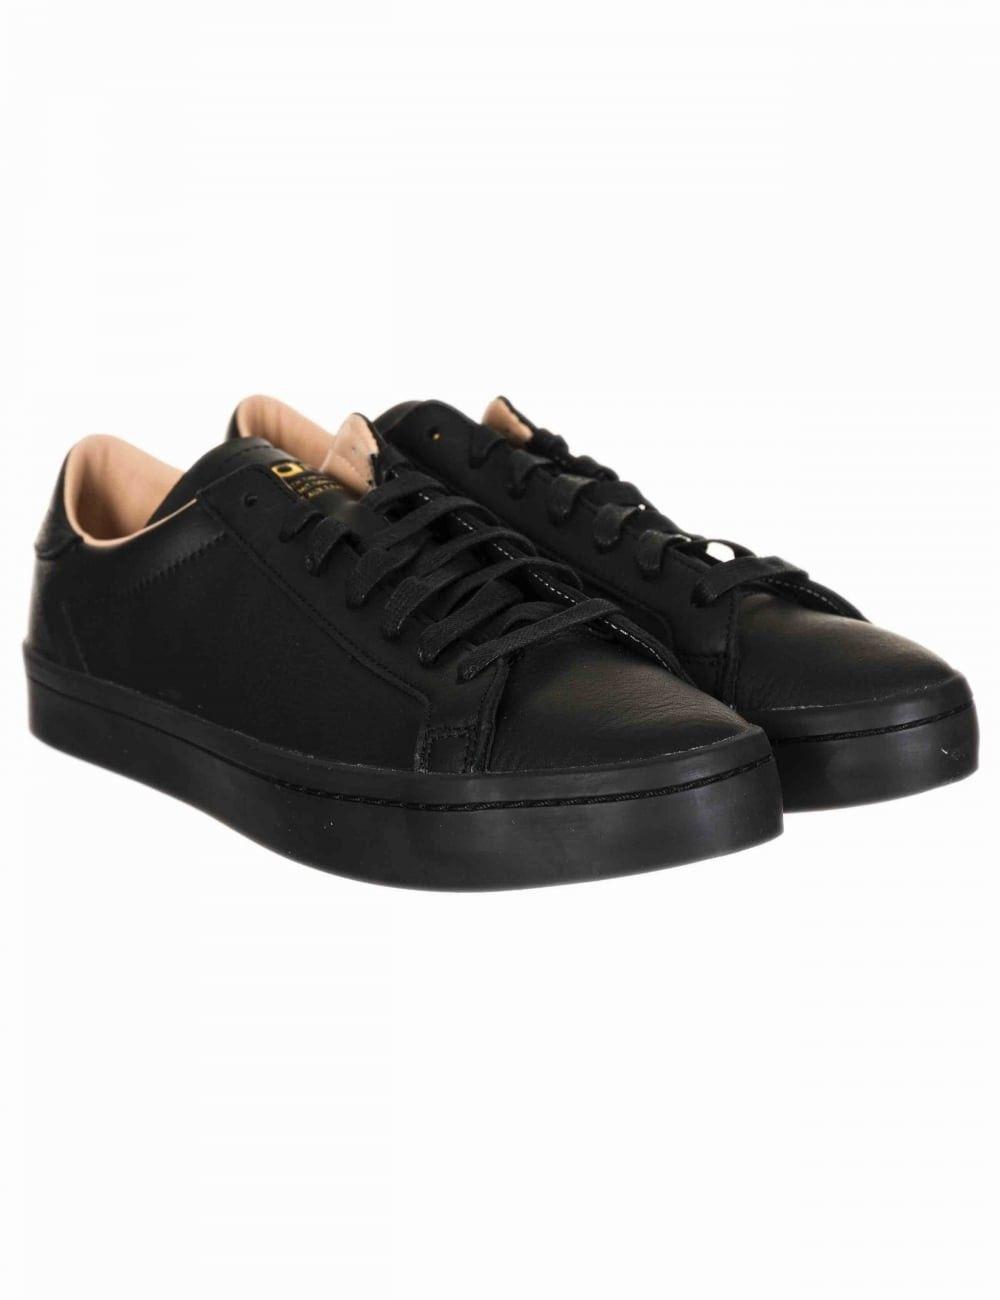 adidas Grand Court Shoes Vit →【Sneakers på Sportamore】